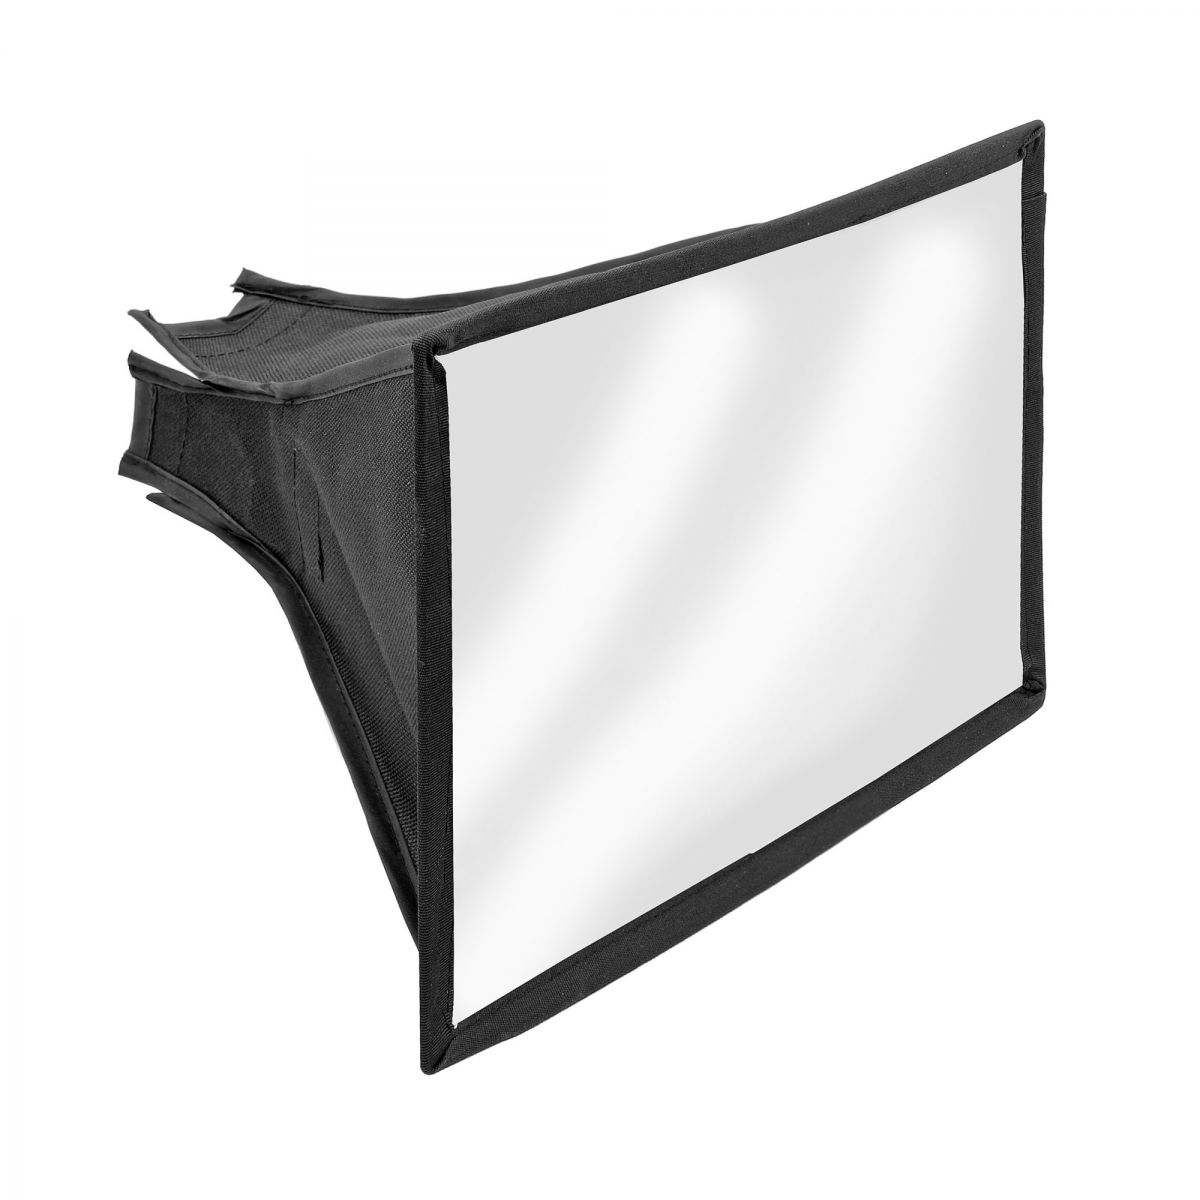 Difusor Softbox para Flashes Universal C/ Bolsa Escolha o Tamanho